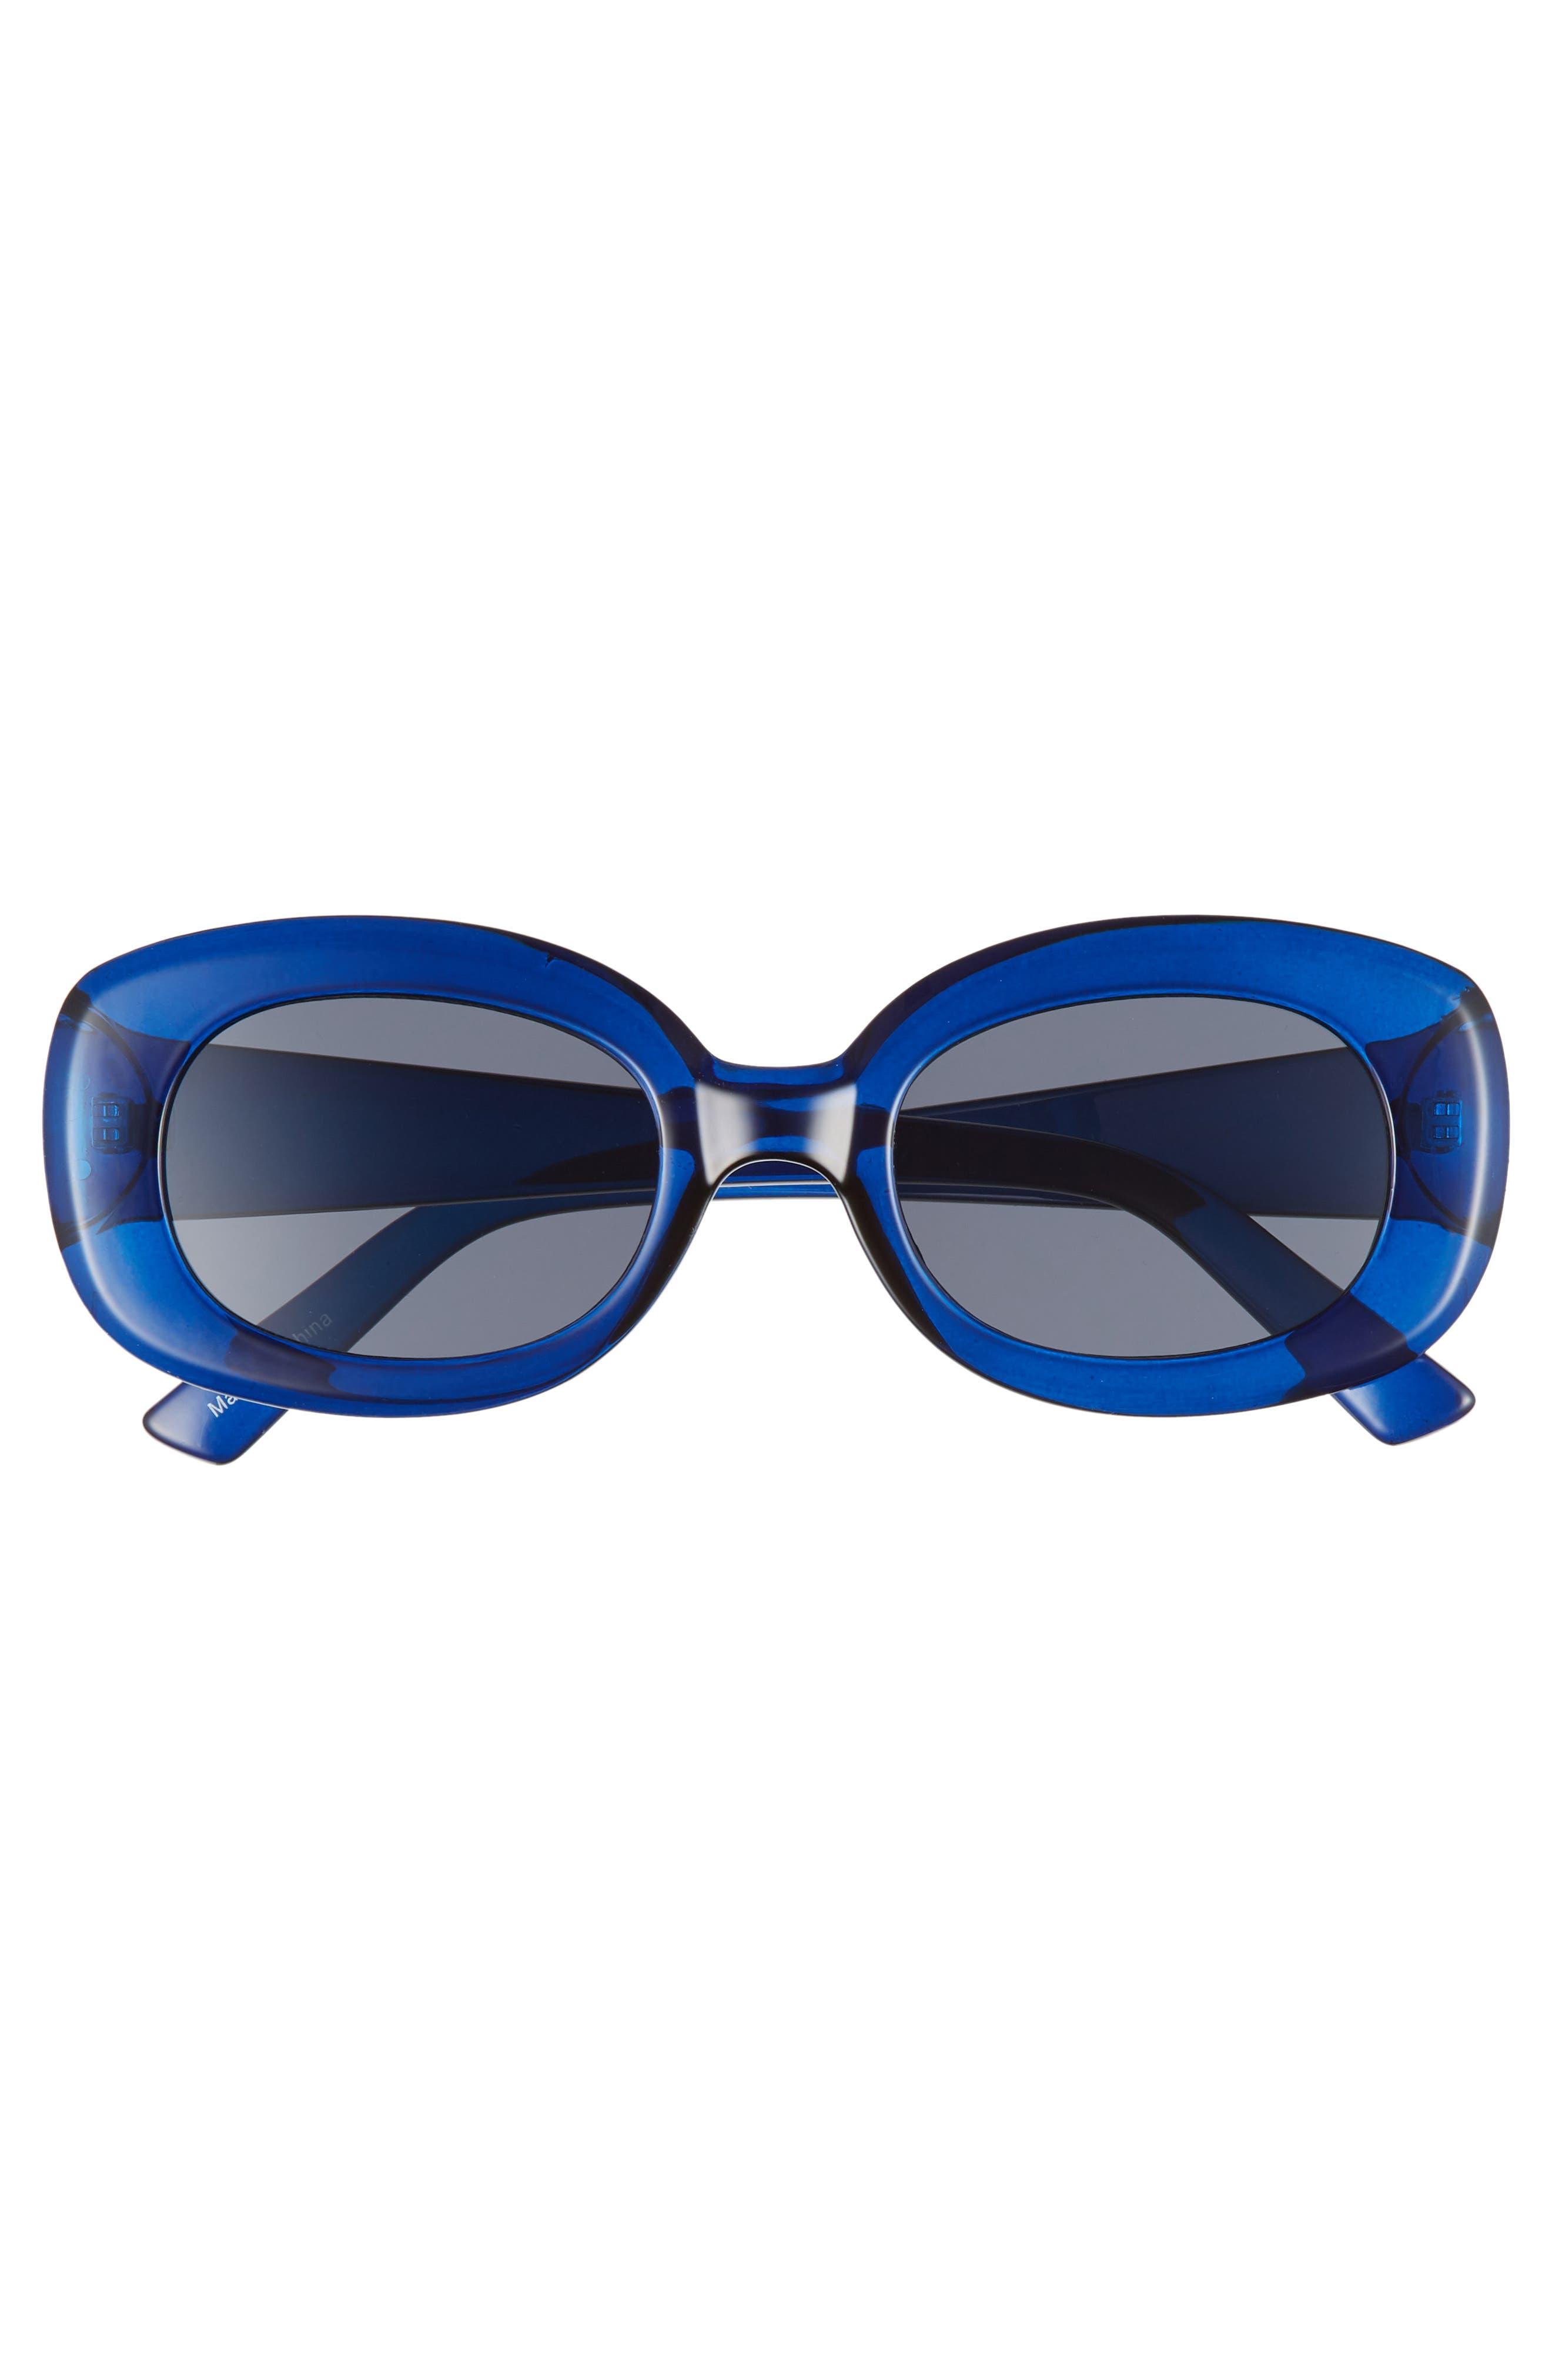 66mm Oval Sunglasses,                             Alternate thumbnail 3, color,                             BLUE/ BLACK